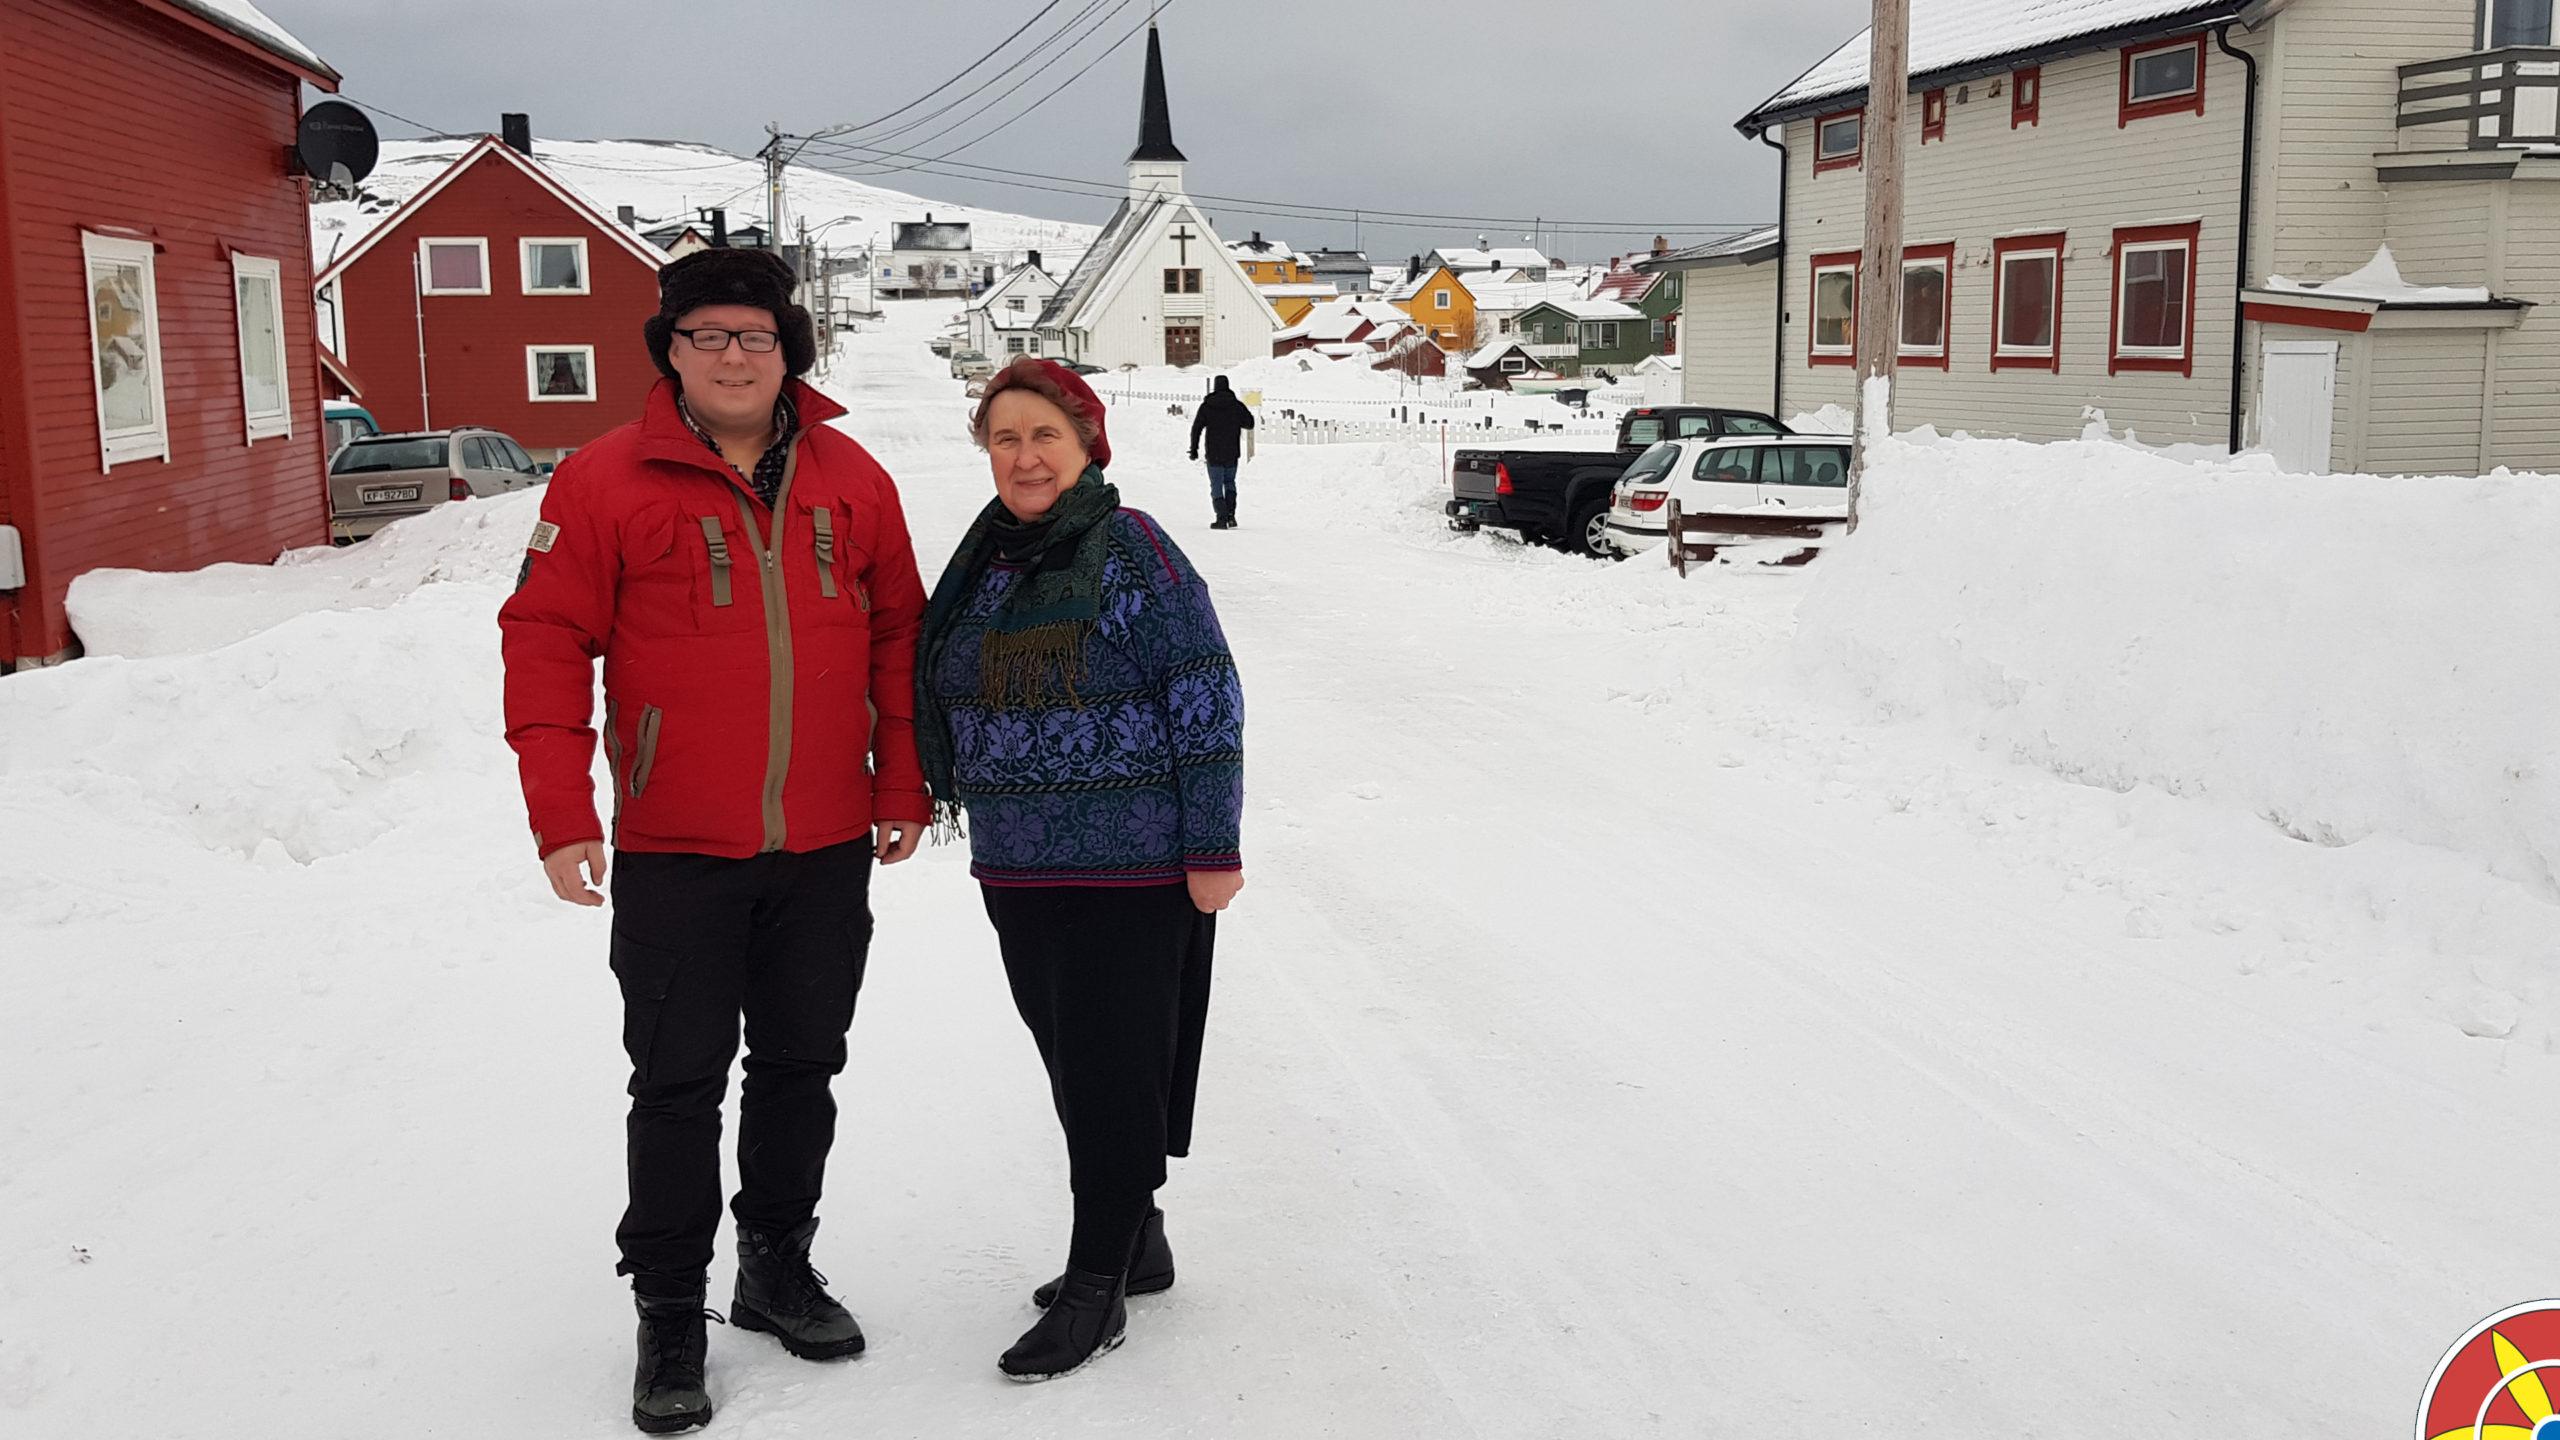 Elsa Ingilæ Haldorsen ja Rune Bjerkli